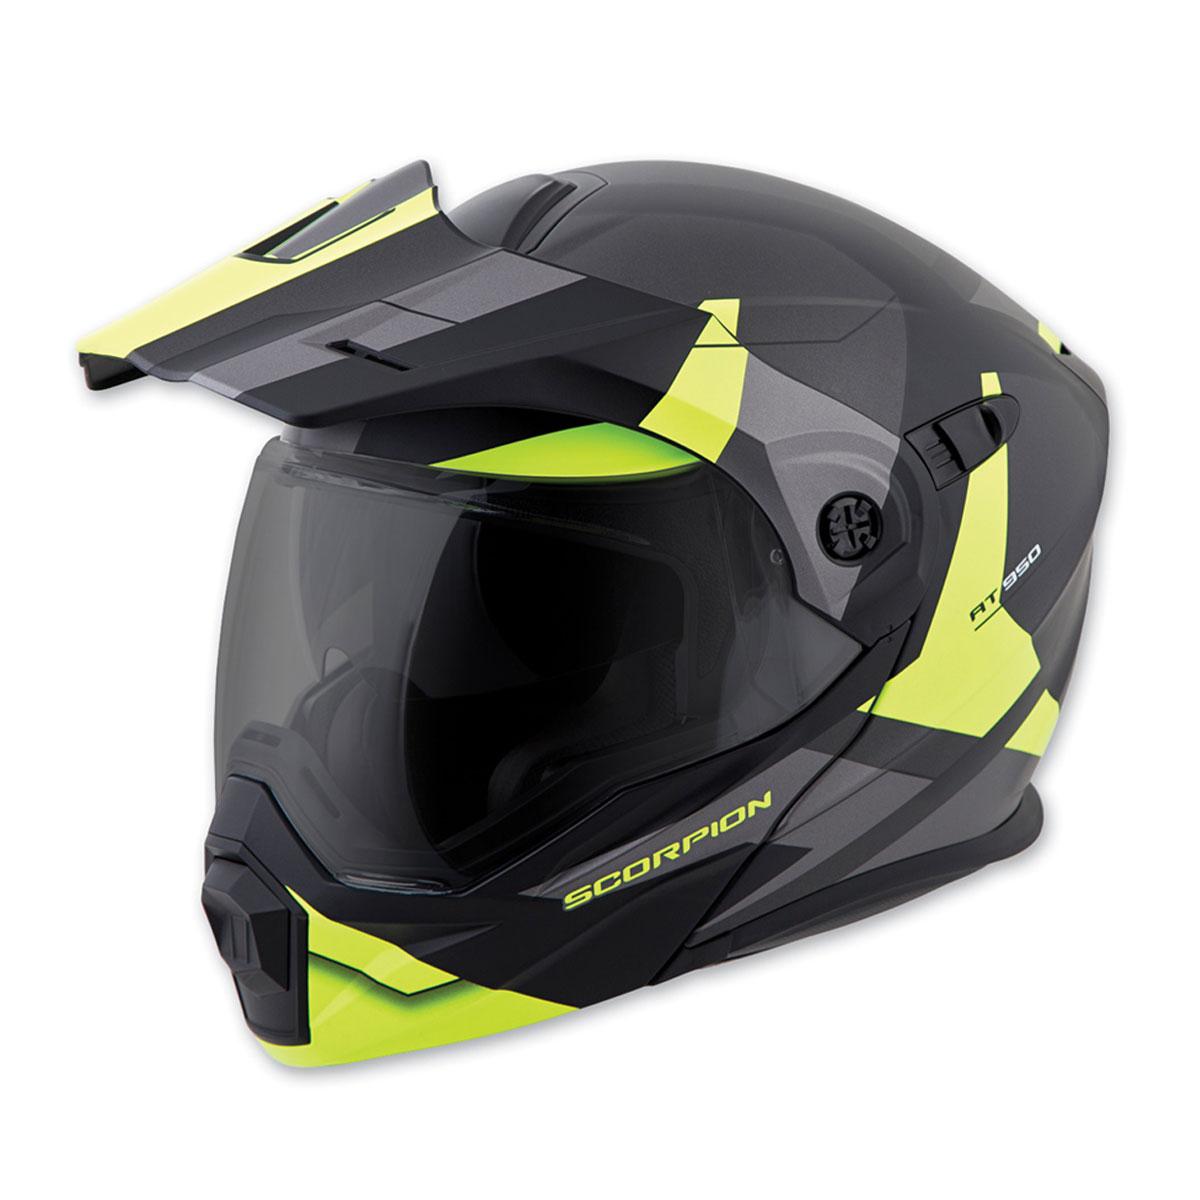 Scorpion EXO EXO-AT950 Neocon Hi-Viz Modular Helmet